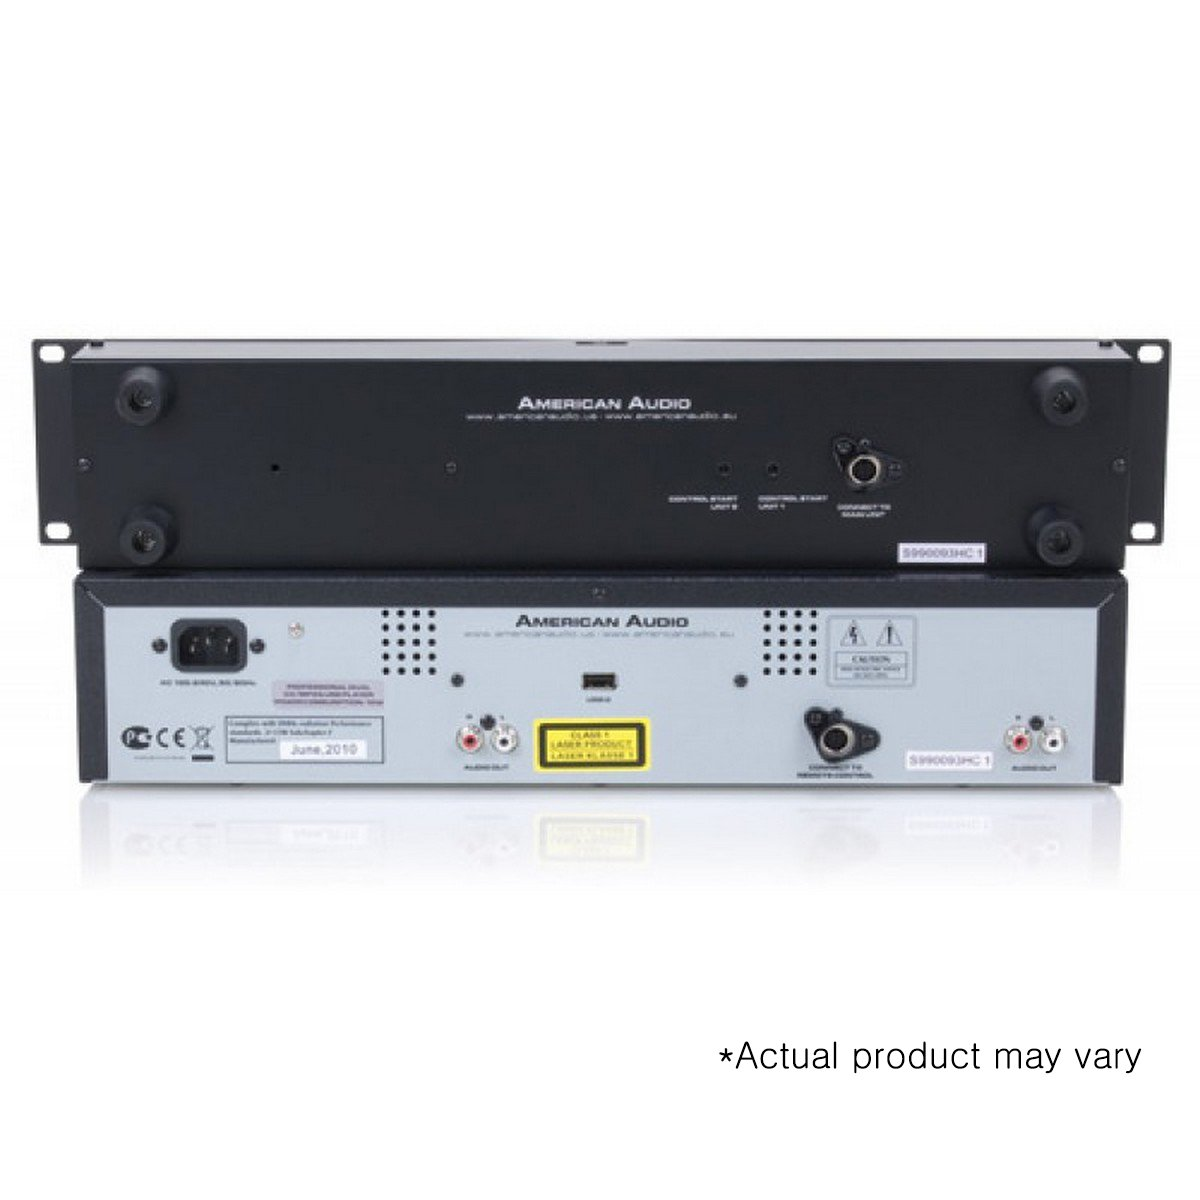 American Audio UCD 200 MK II | Dual CD MP3 Player USB Playback by American Audio